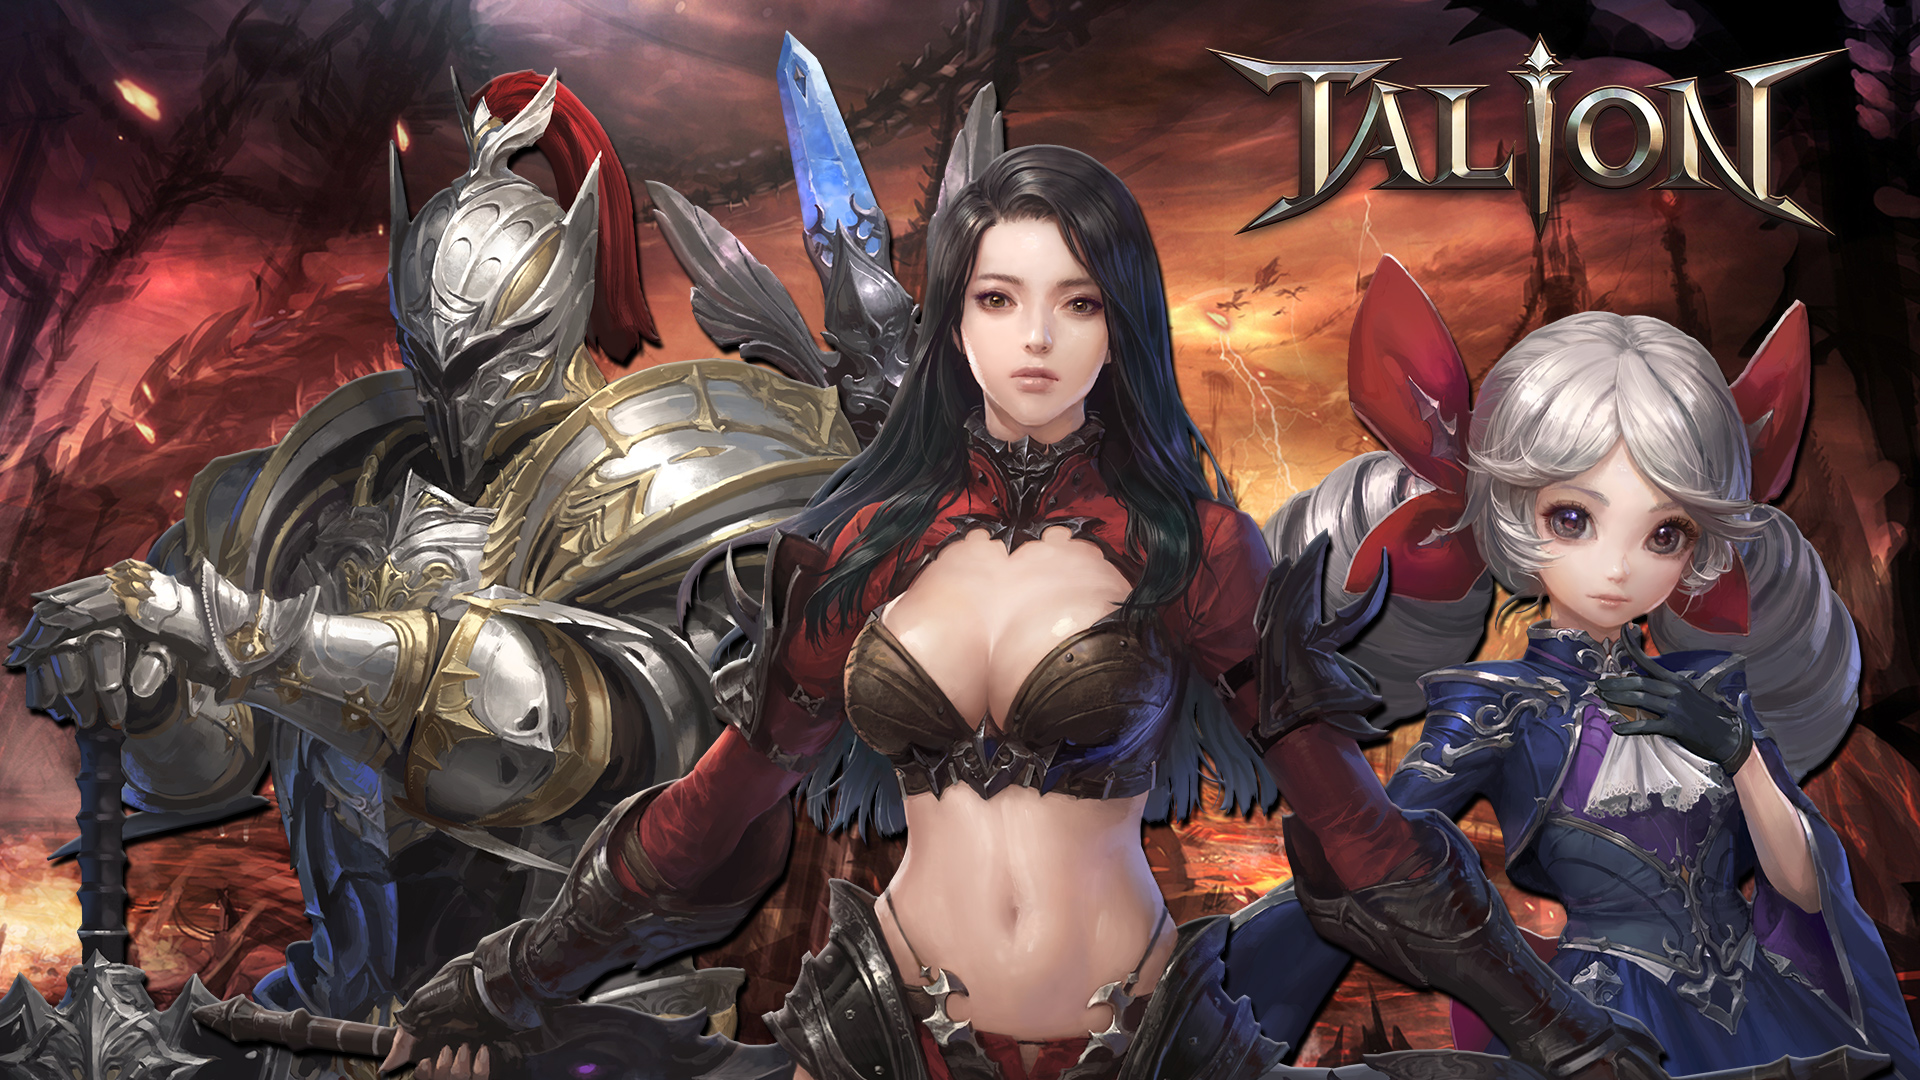 Talion 3052018 51